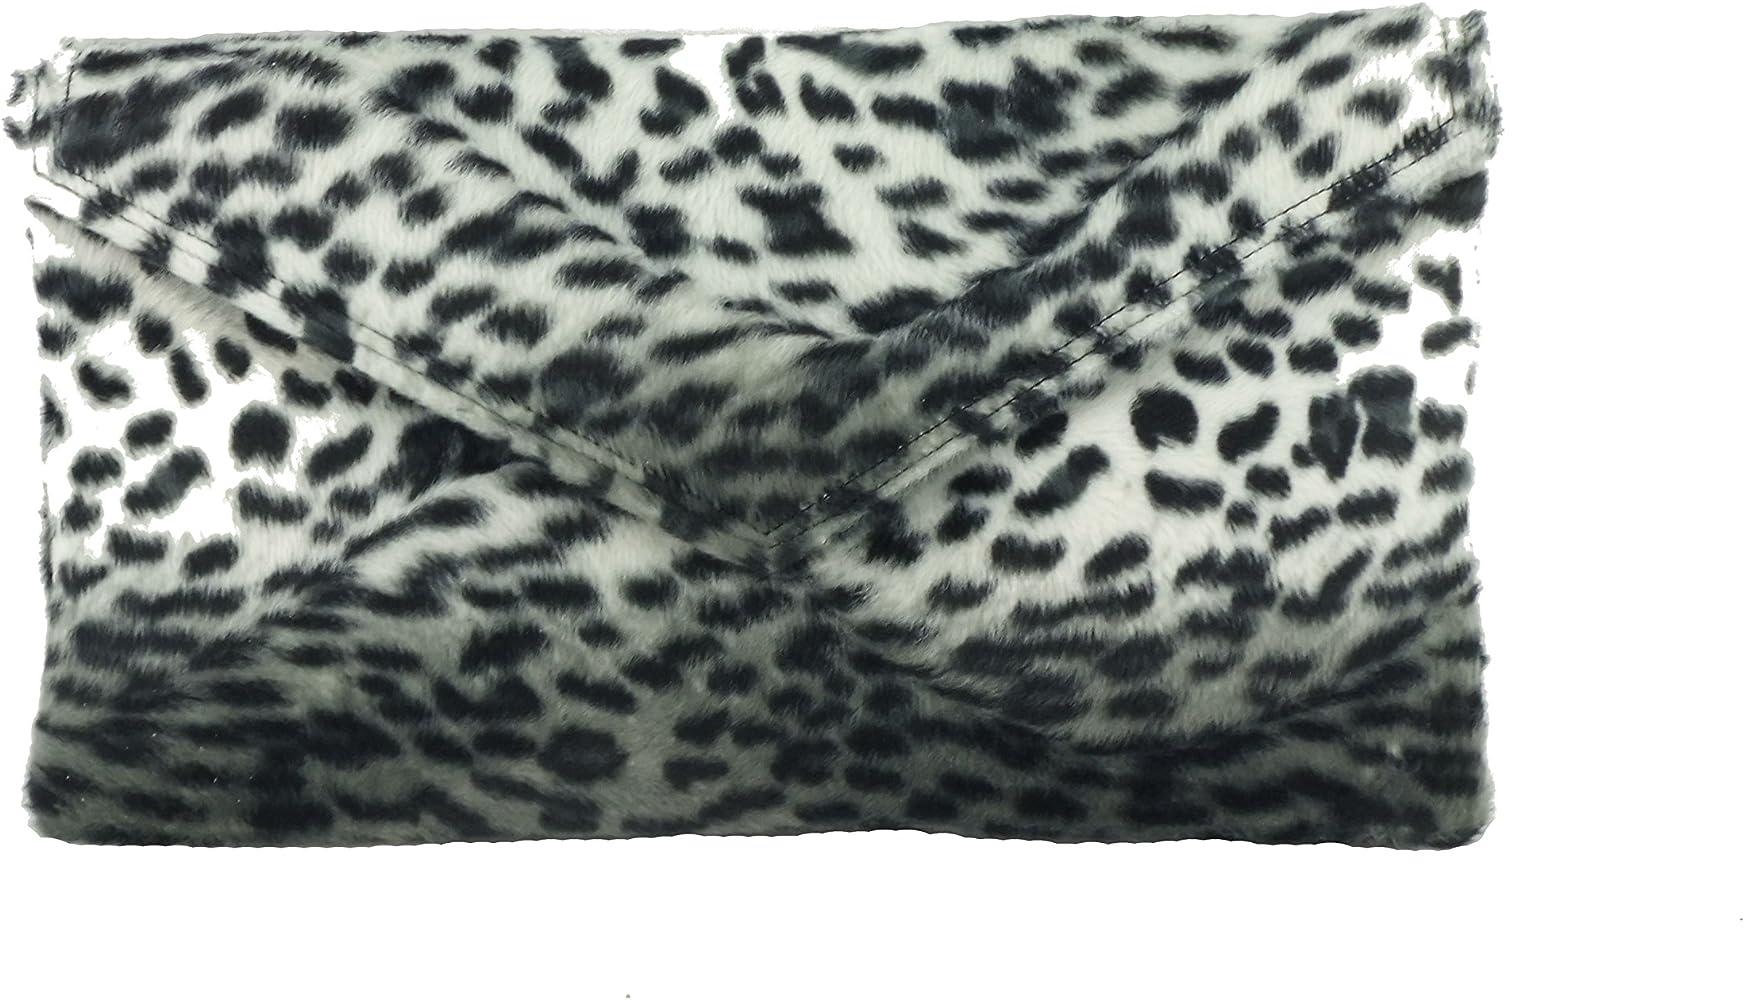 Neat Envelope Animal Print Clutch Bag//Shoulder Bag in Leopard Zebra or Cheetah